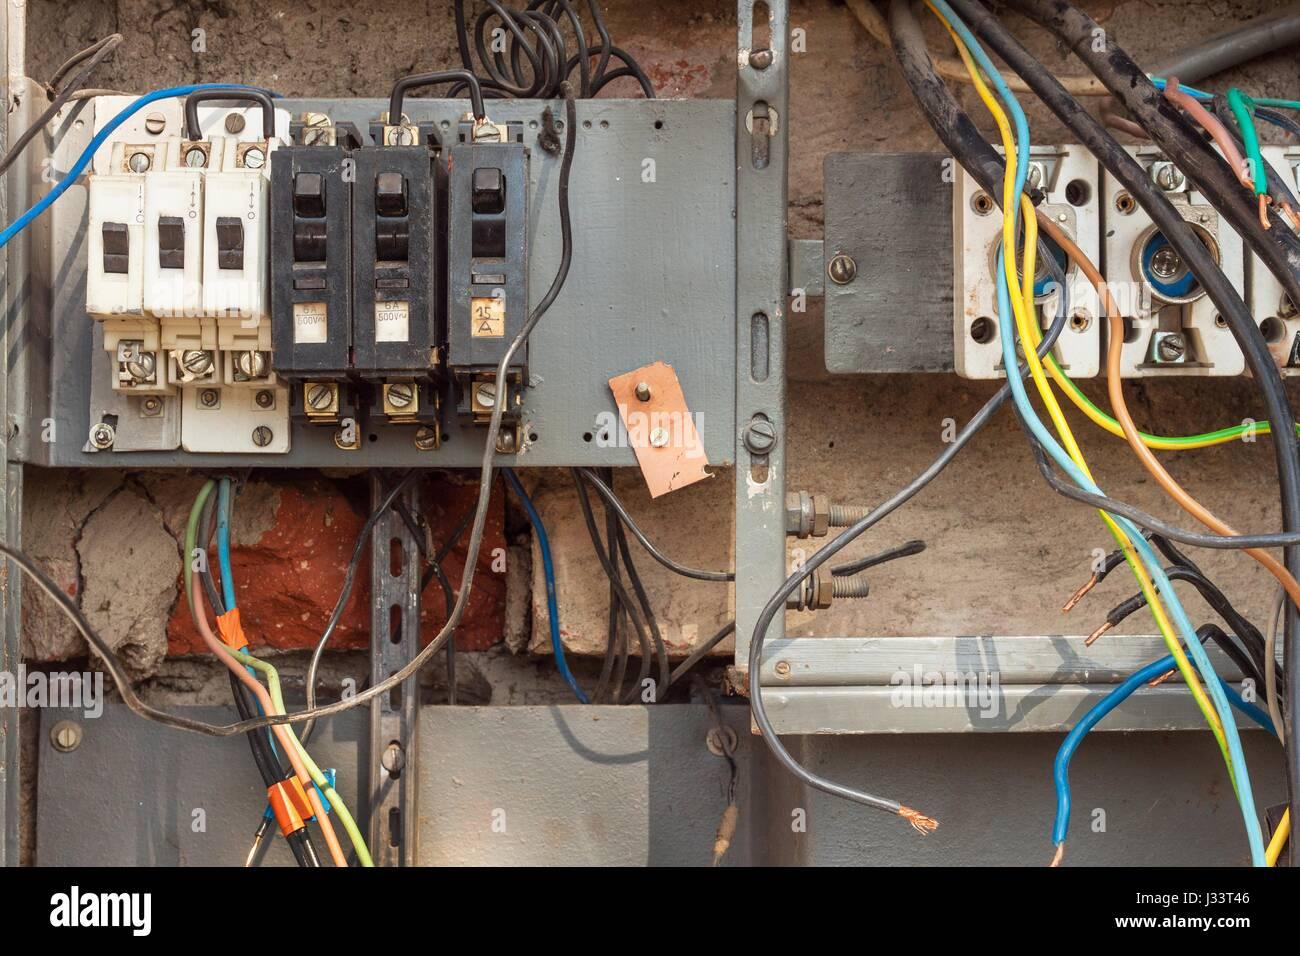 wfco 55 amp power converter wiring diagram progressive